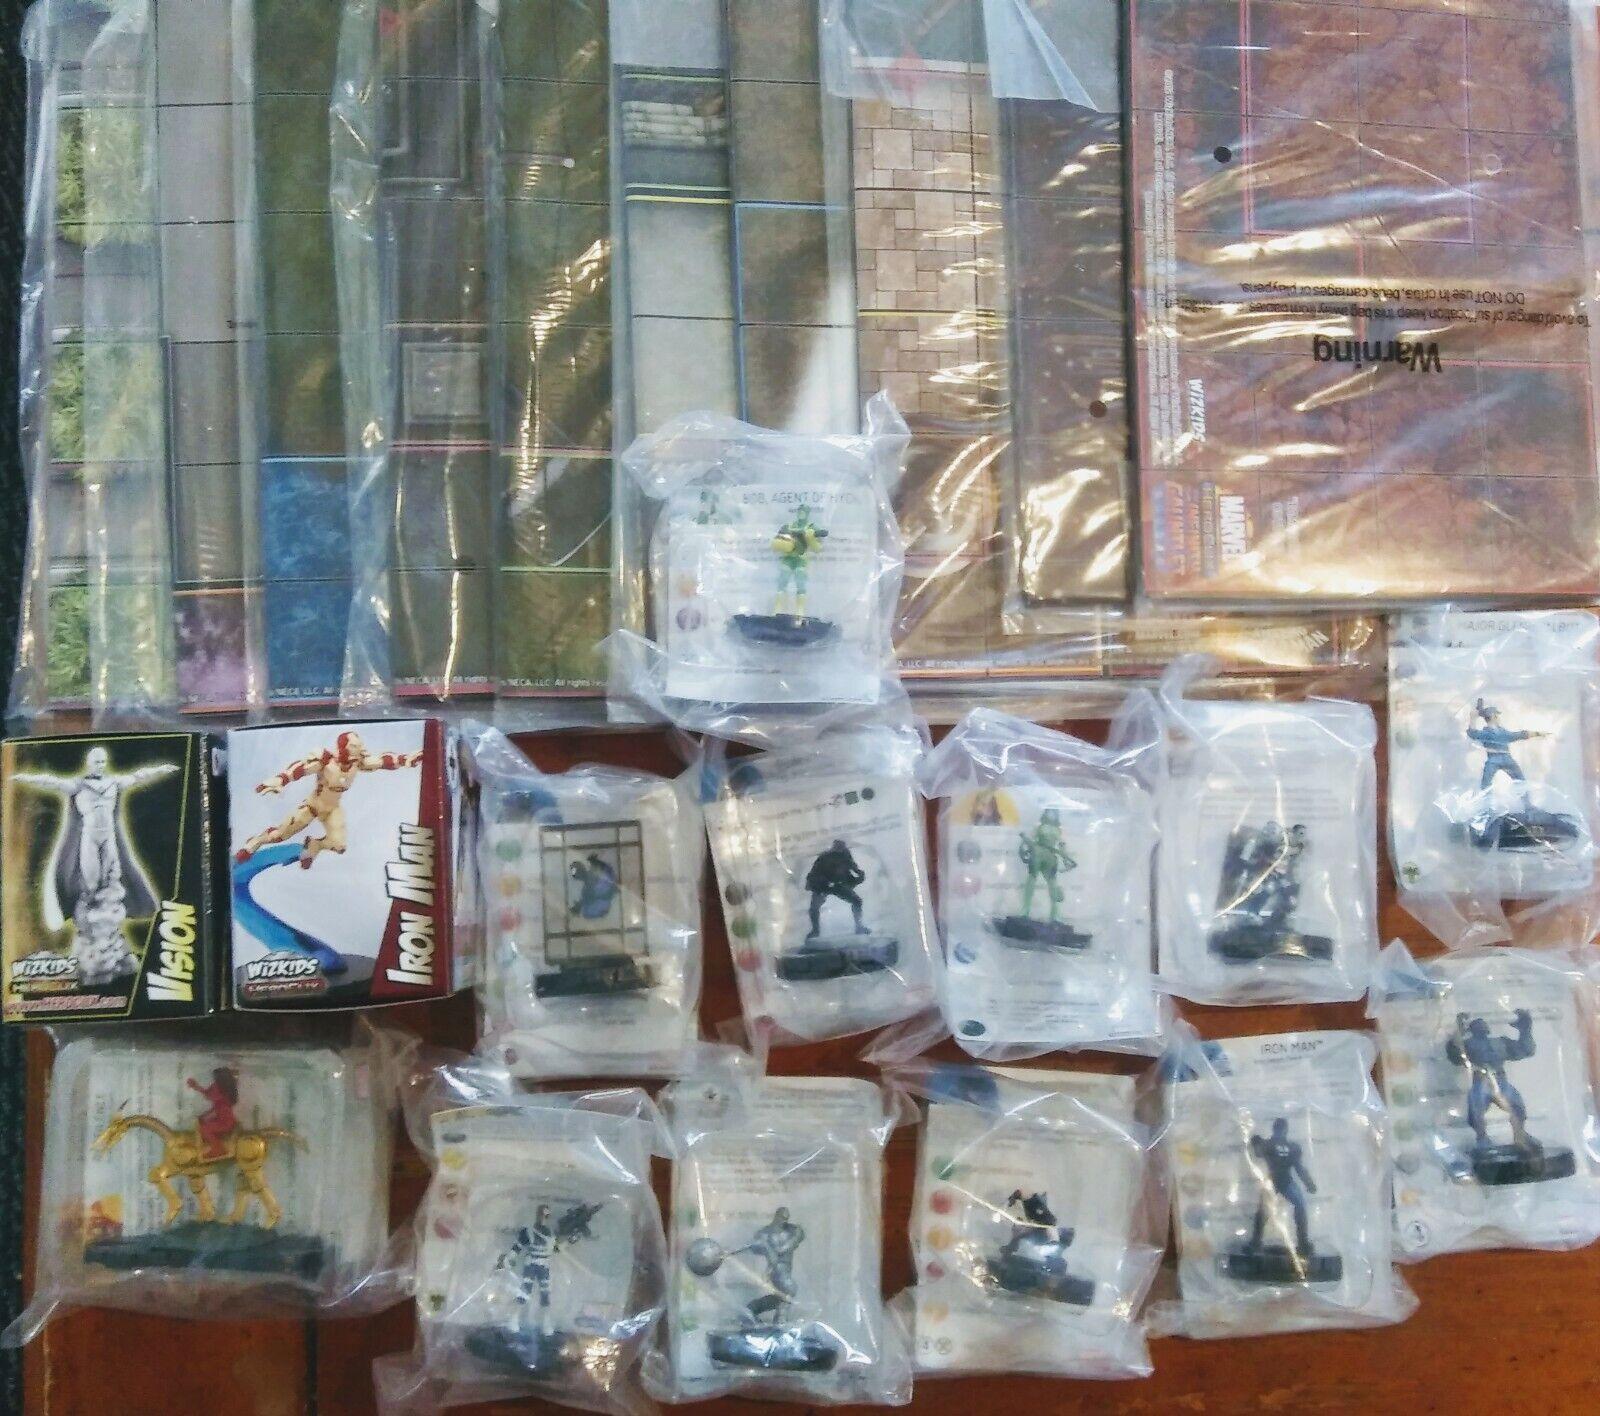 Lote de Heroclix Marvel Marqués, Figuras, Mapas - 24 piezas